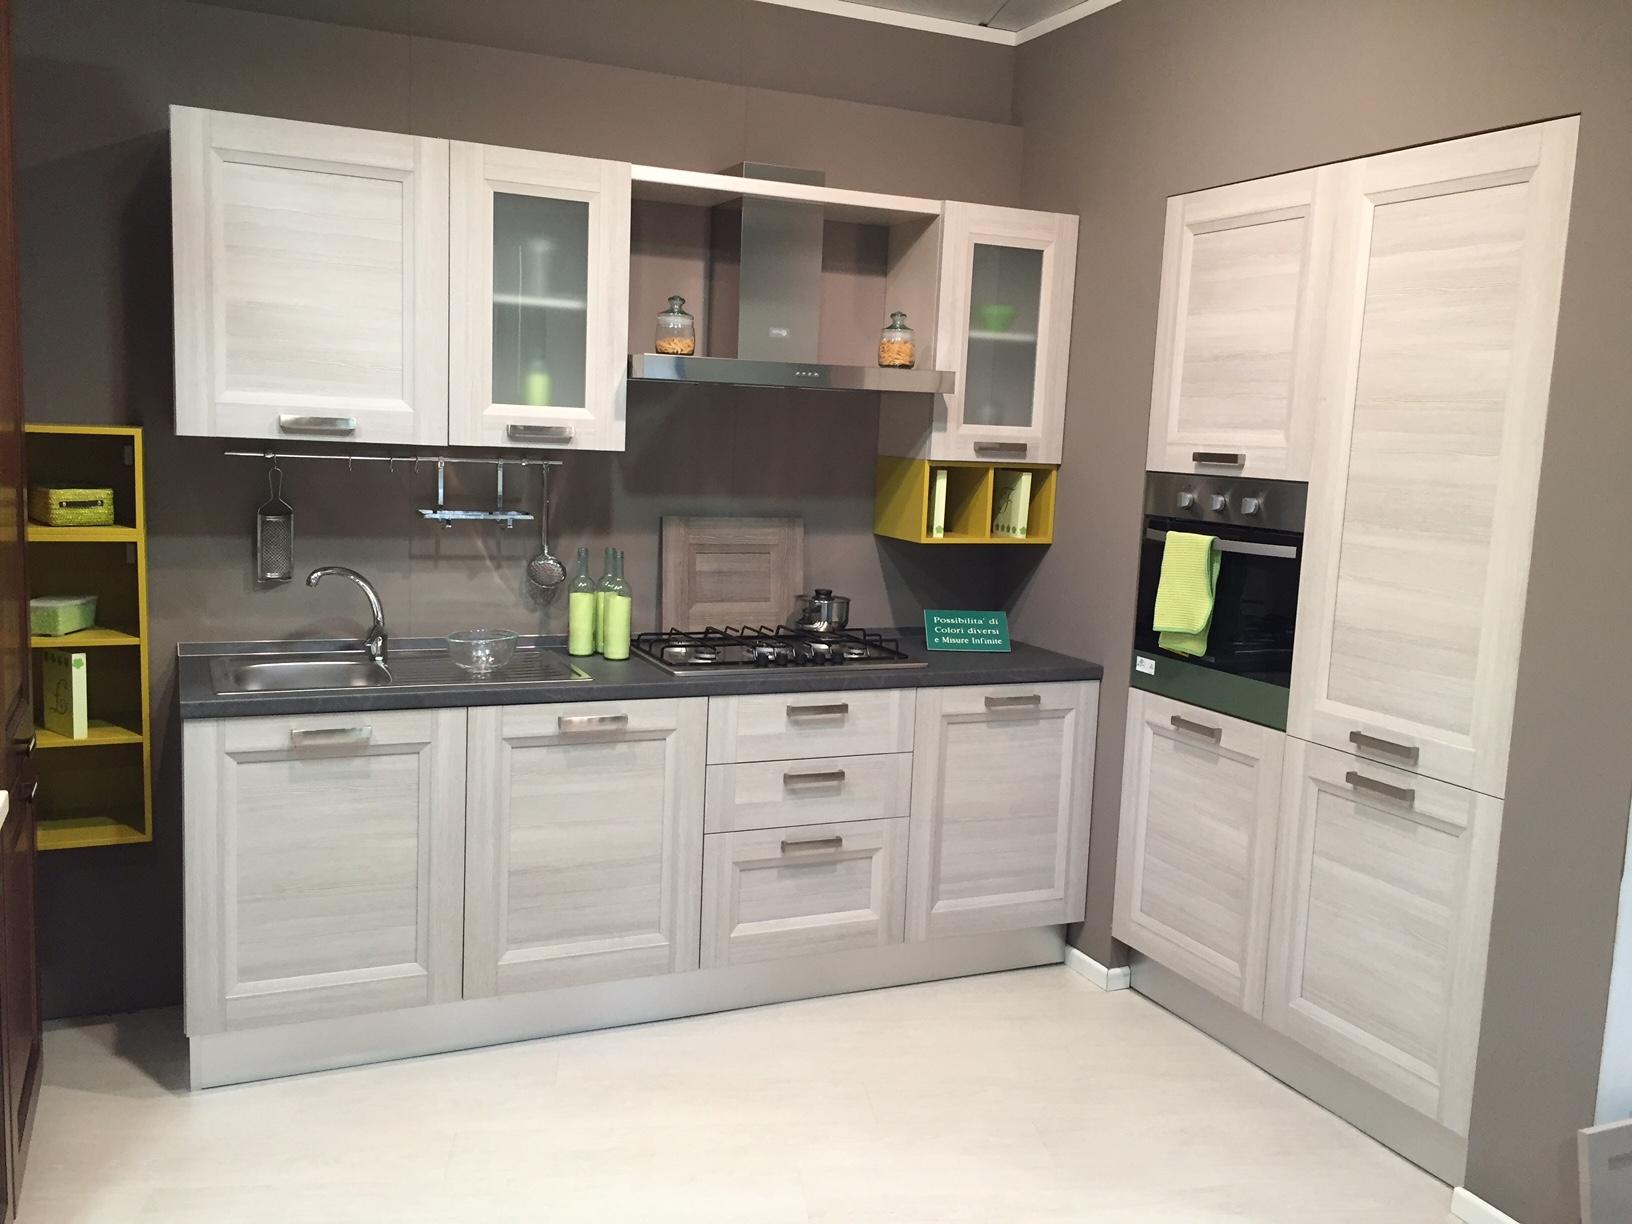 Cucina creo kitchens mya moderno laminato materico larice - Lunghezza cucina ...